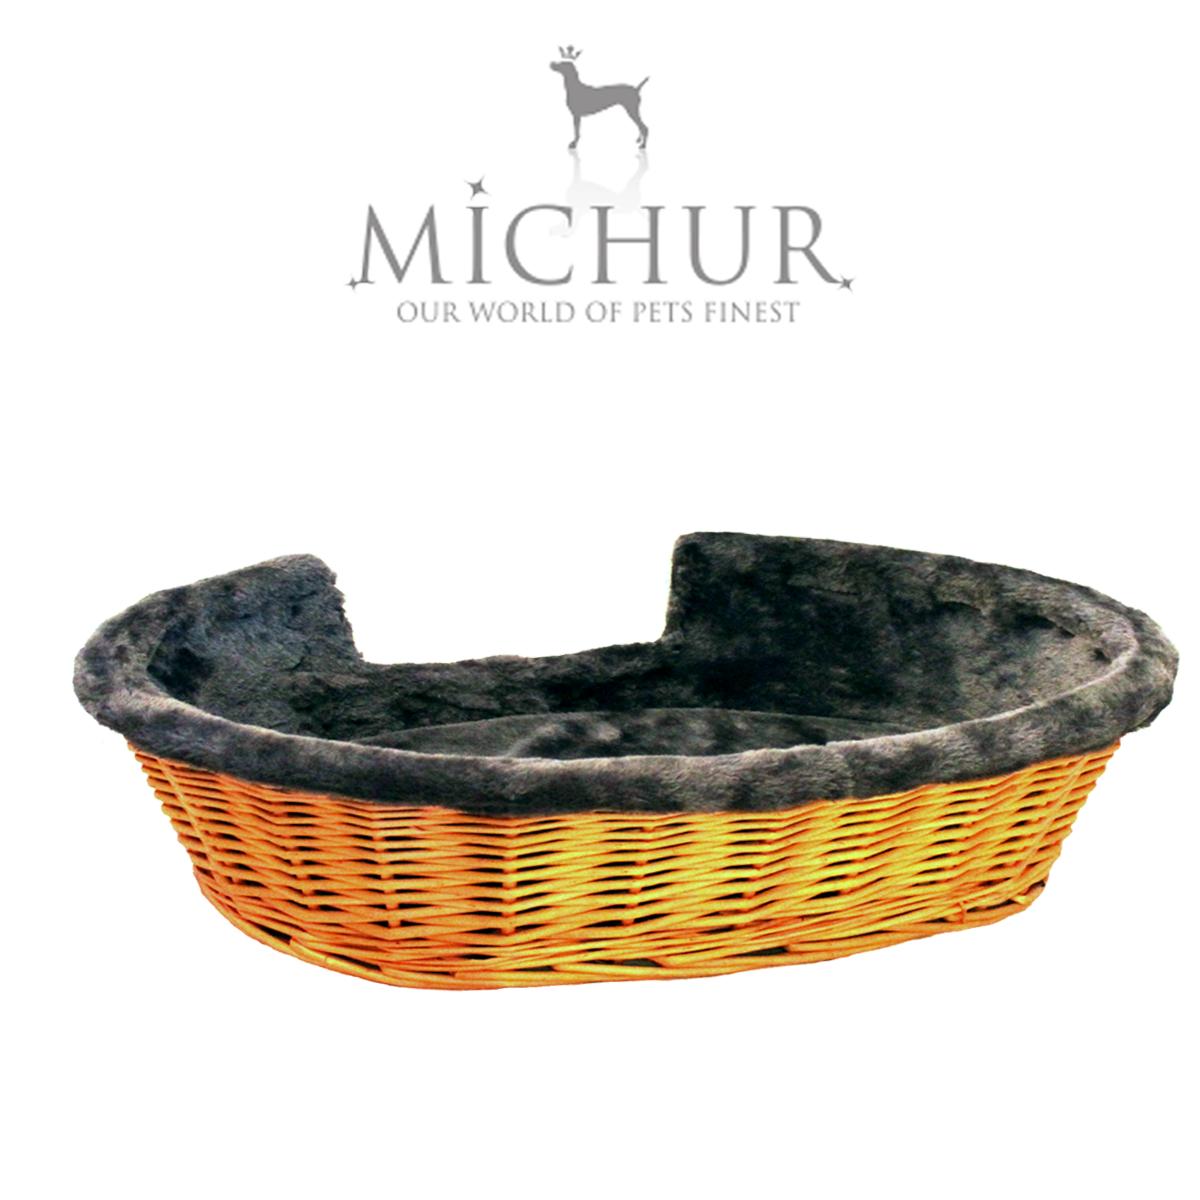 Handmade Wicker Dog Basket : Michur lumpi cognac dog cat basket cave bed rattan